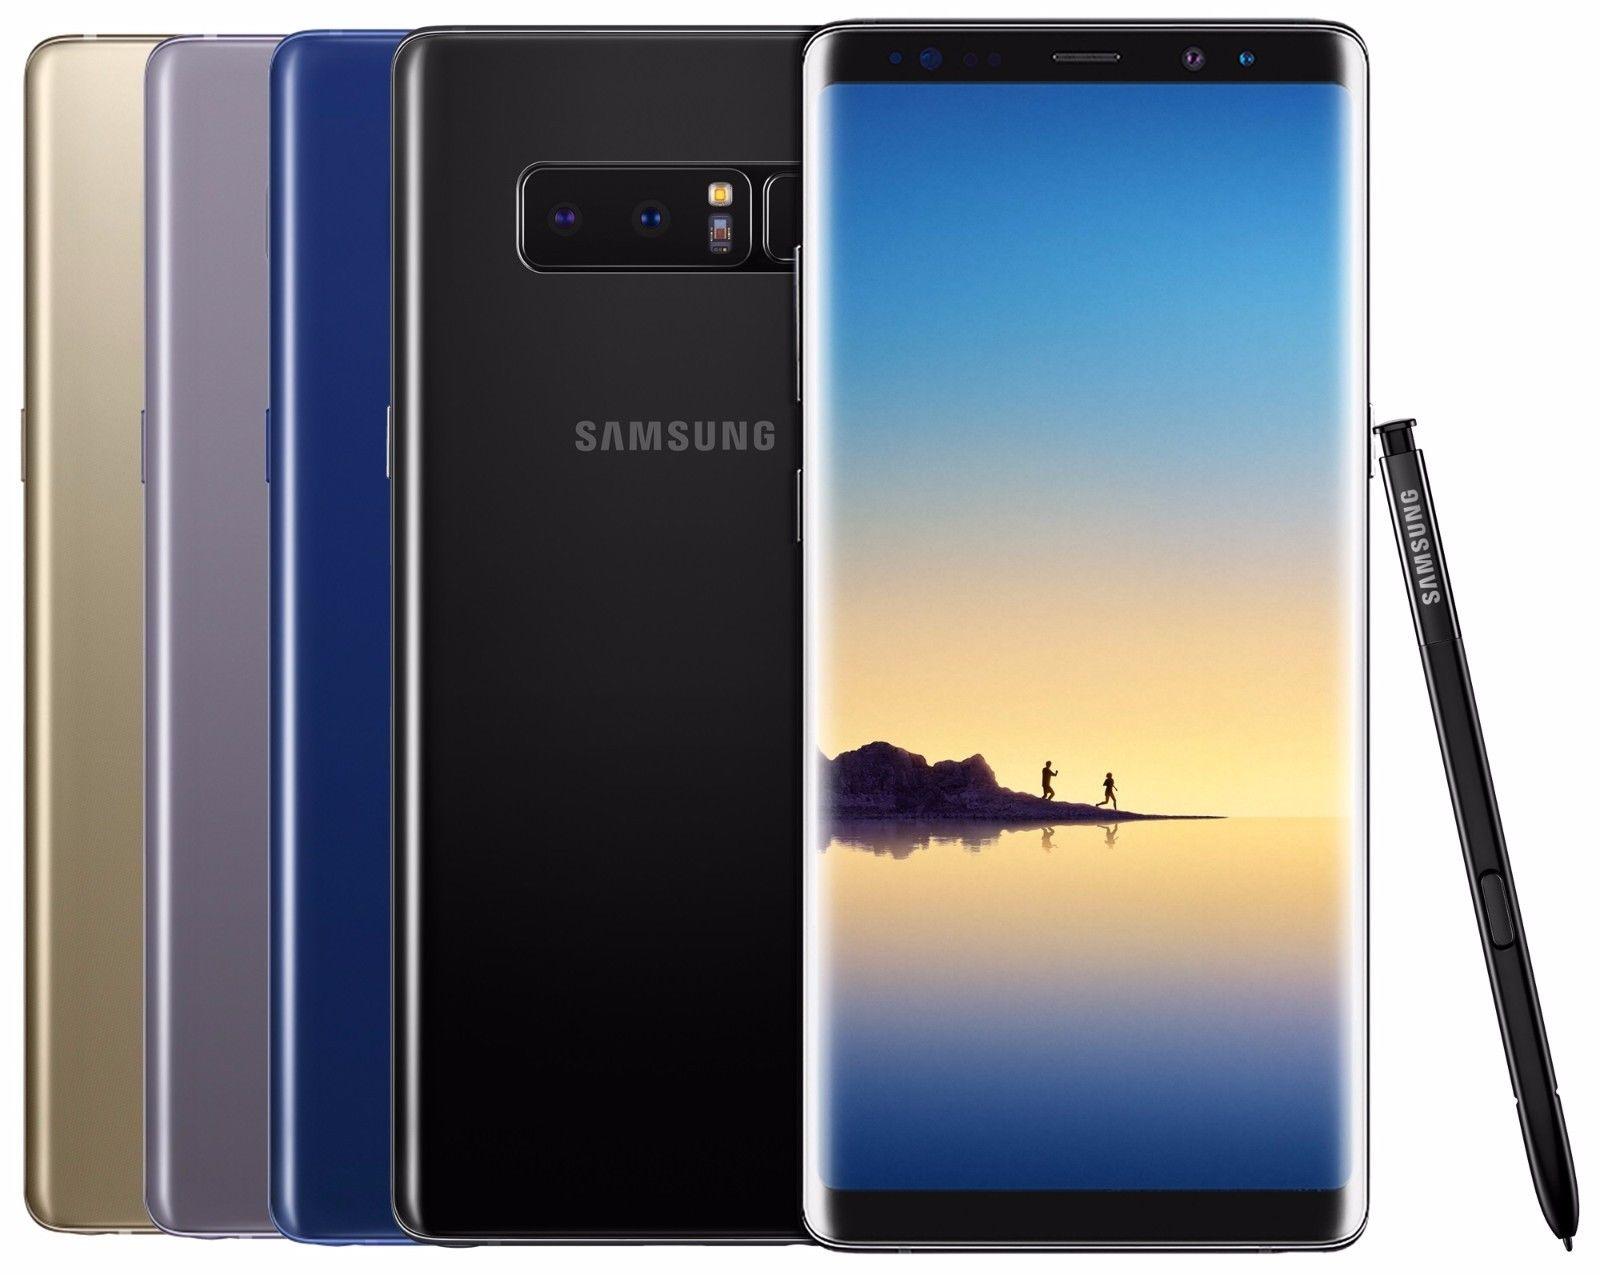 Samsung Galaxy Note 8 (64GB Factory Unlocked) for $729.99 on eBay